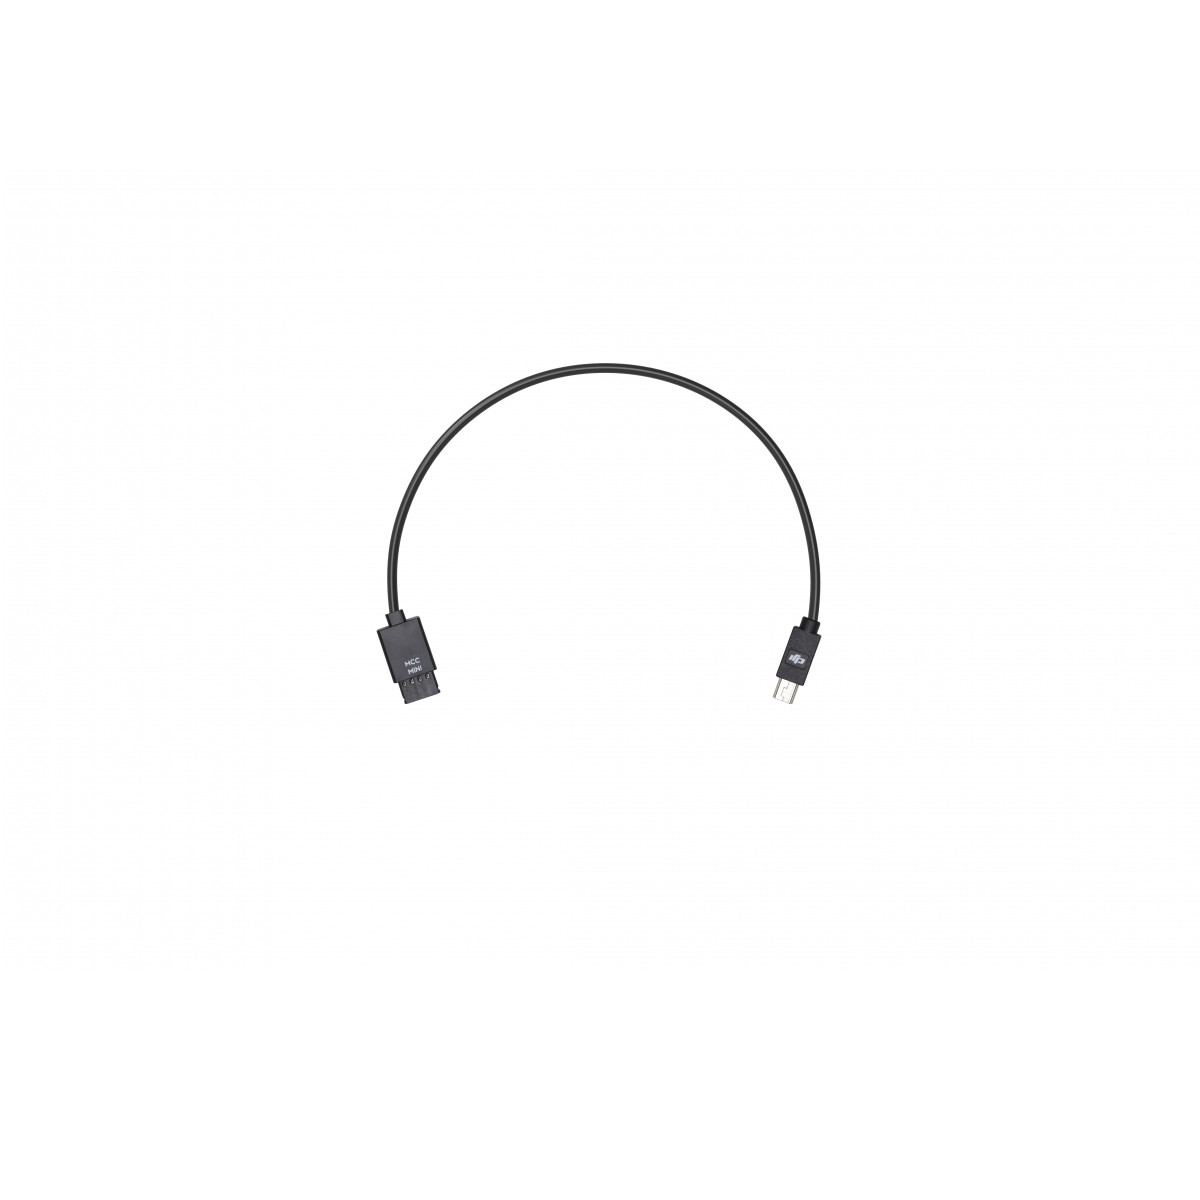 Мультикамерный кабель mini USB для Ronin-S